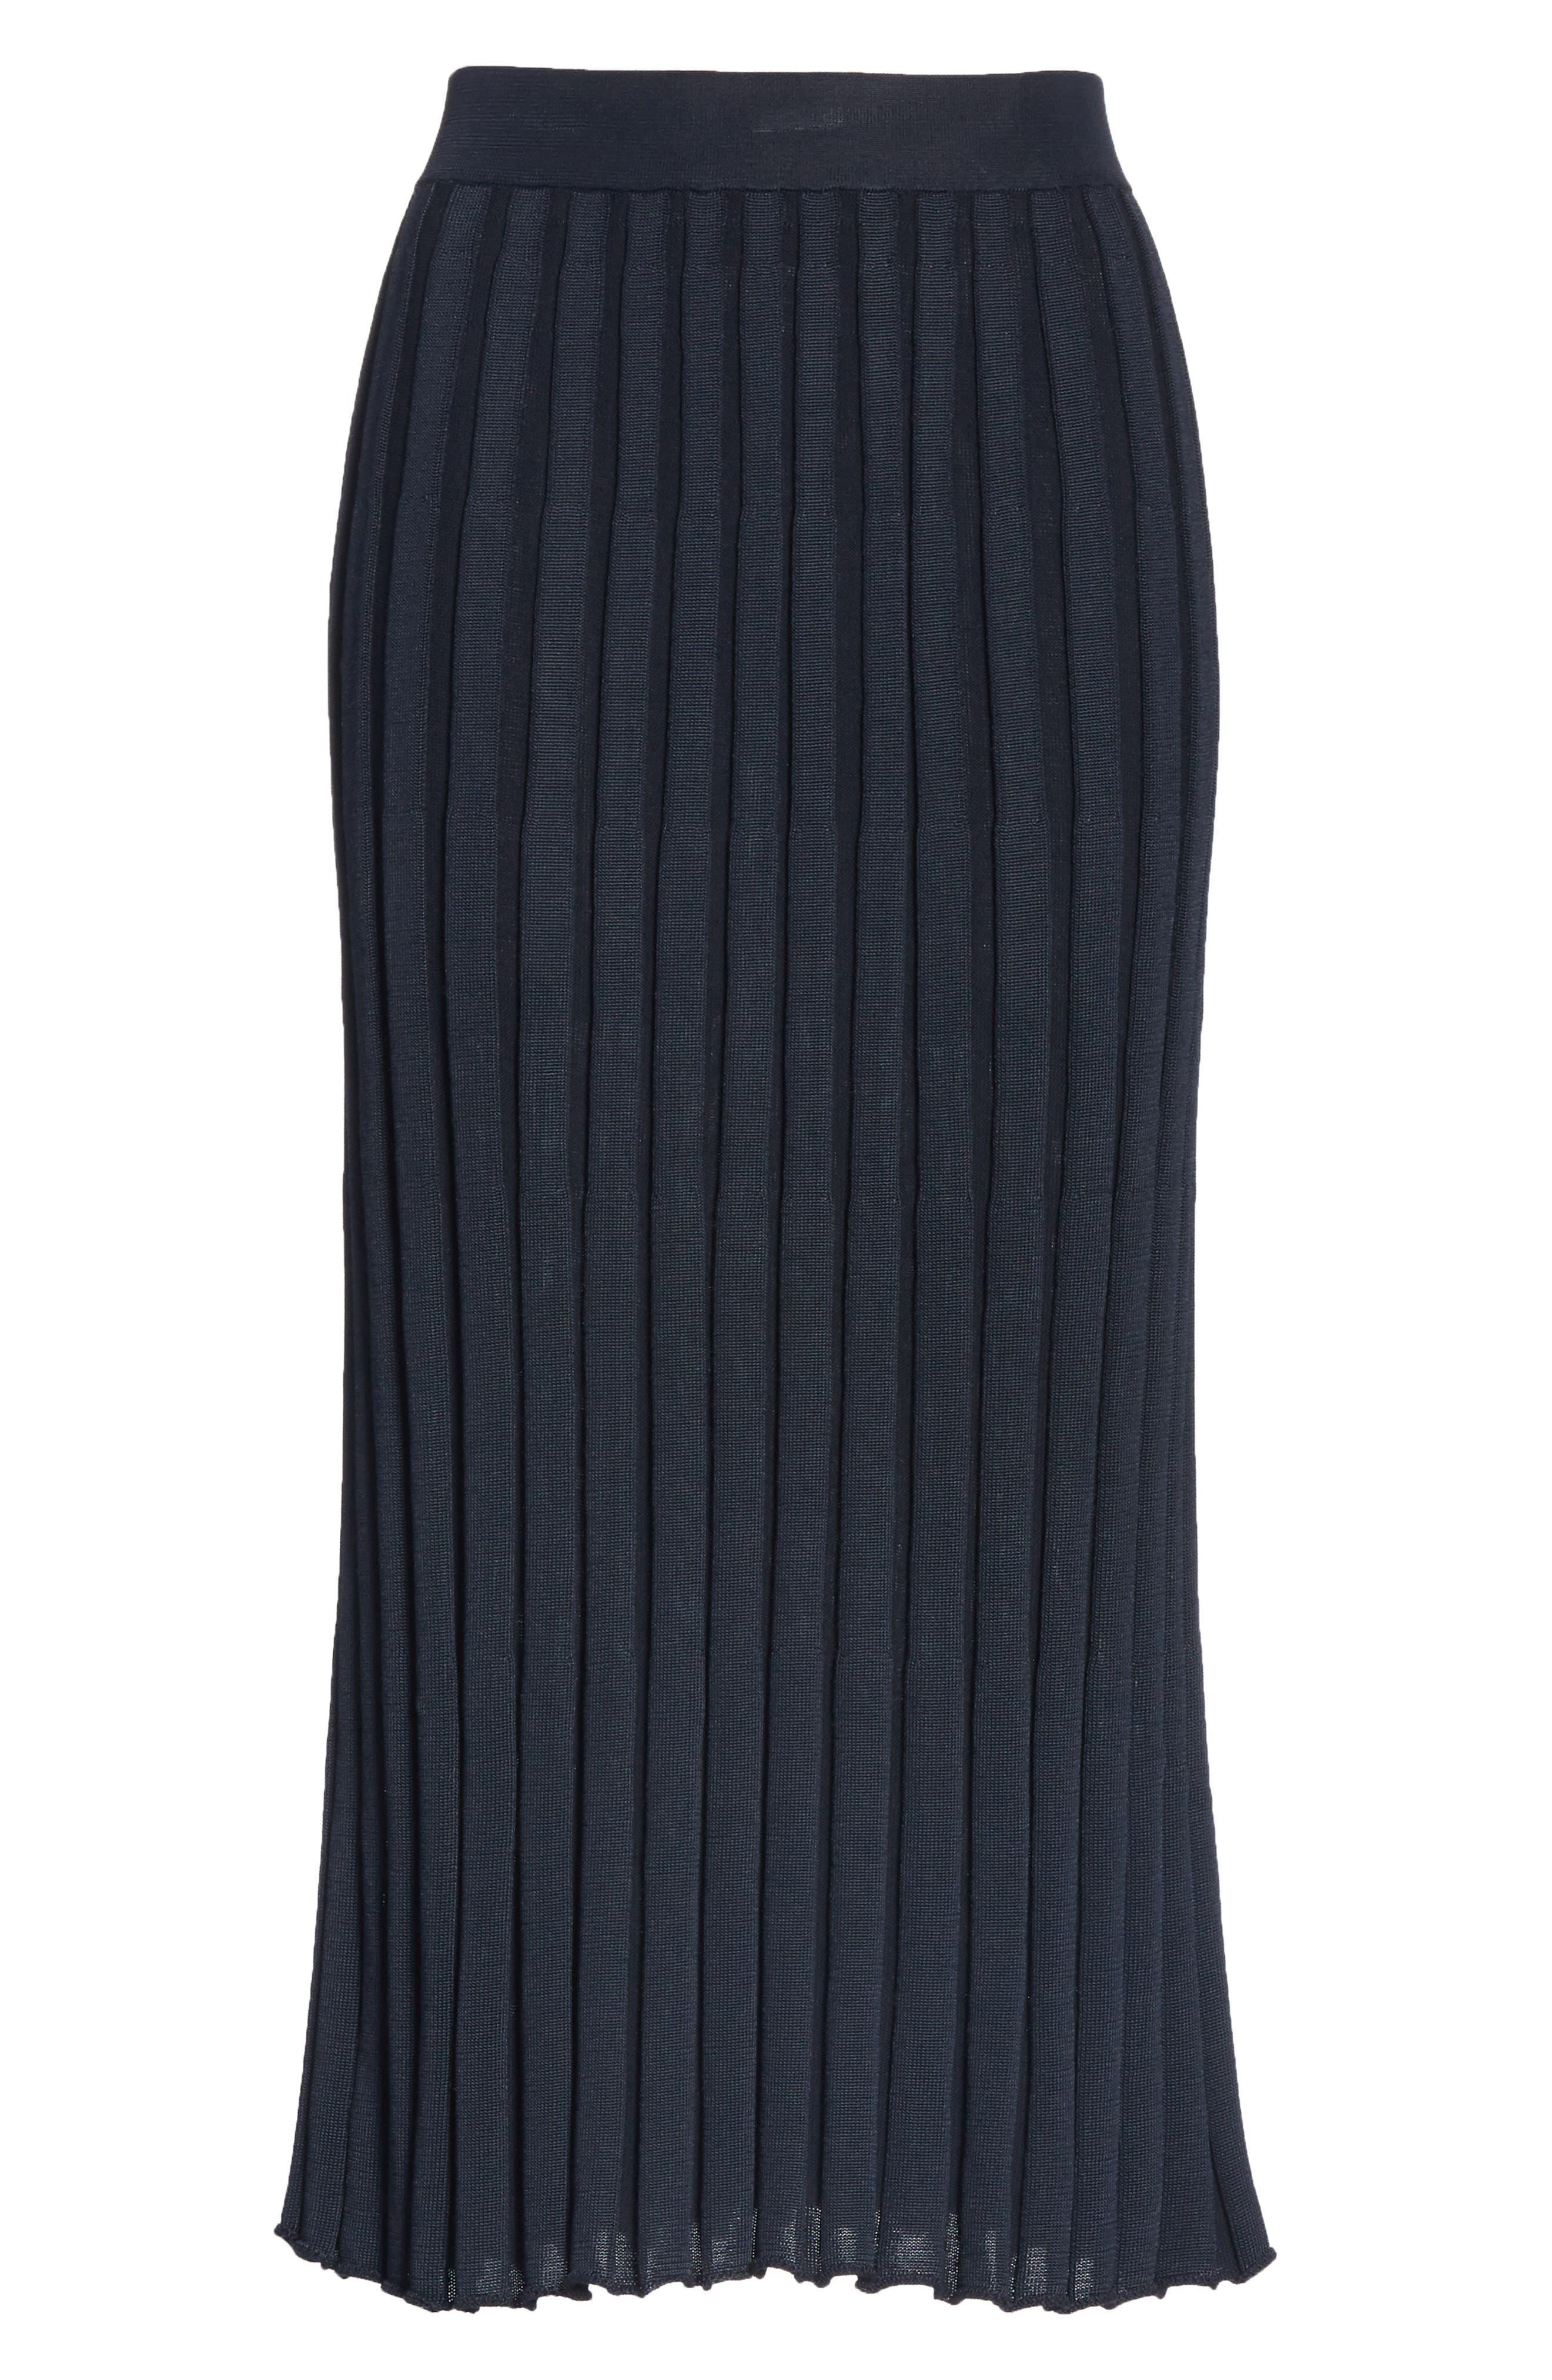 Metropolitan Shine Plaited Rib Skirt,                             Alternate thumbnail 6, color,                             400